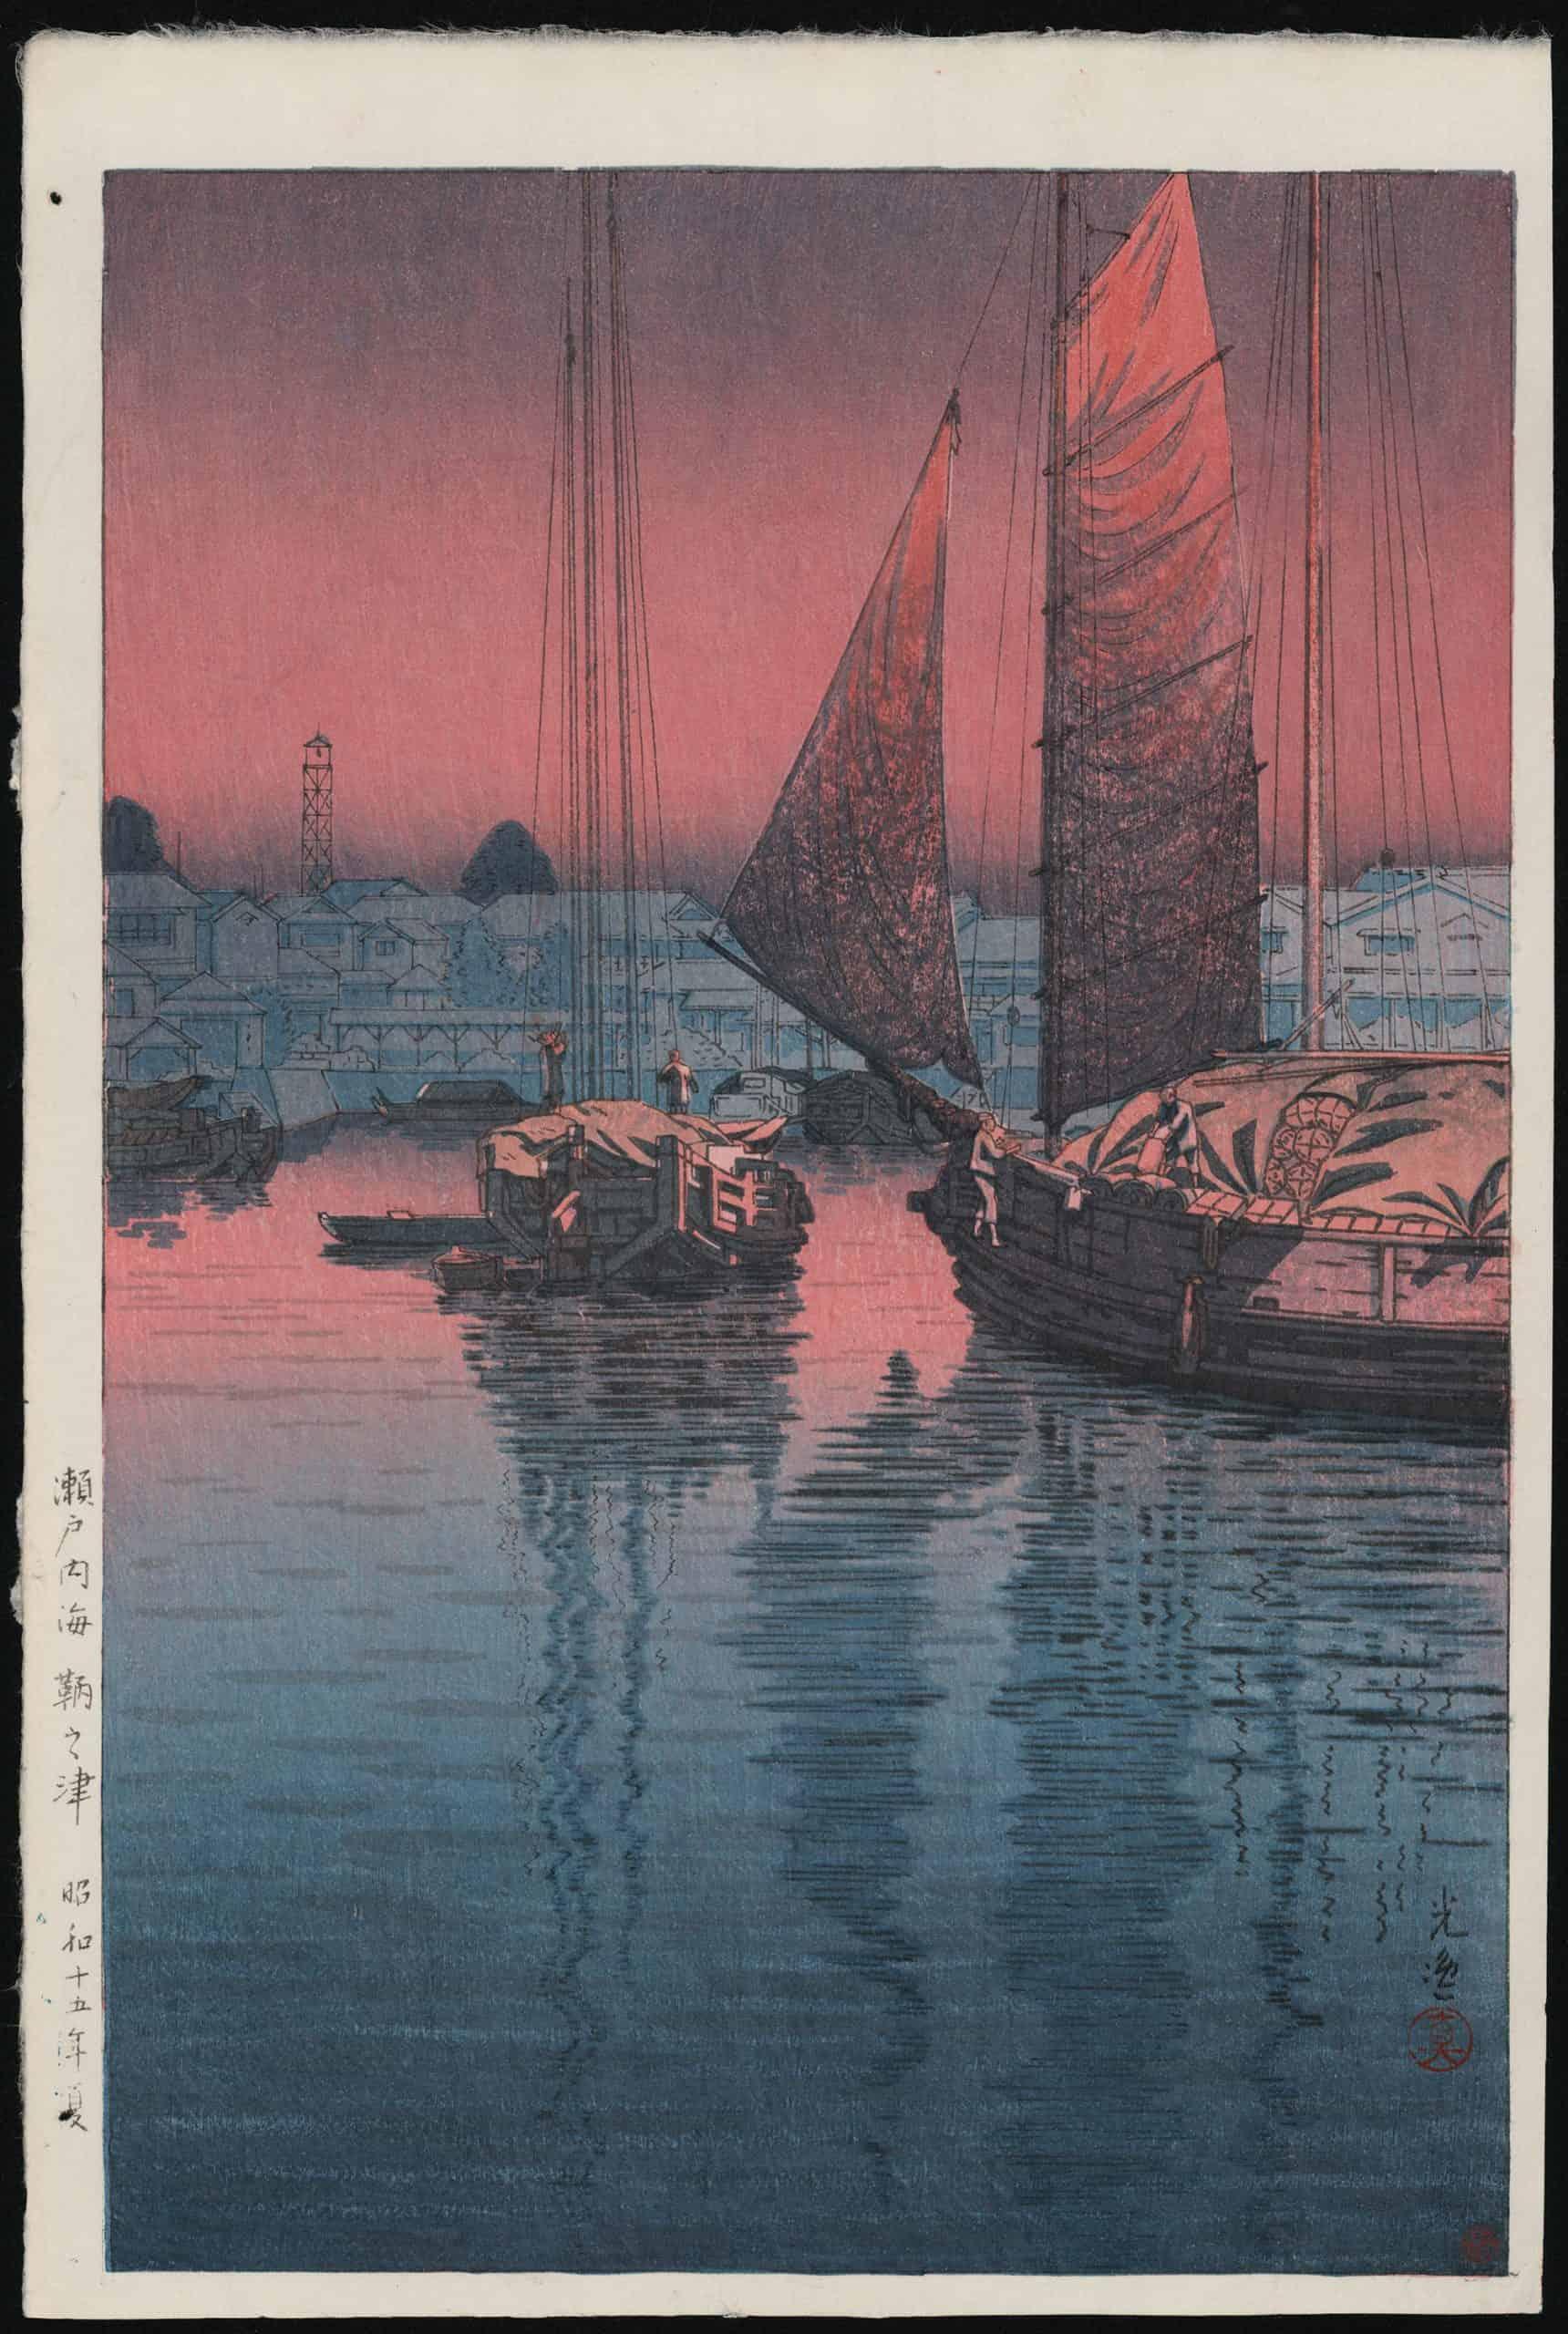 Tsuchiya Koitsu - Sunset at Tomonotsu, Inland Sea